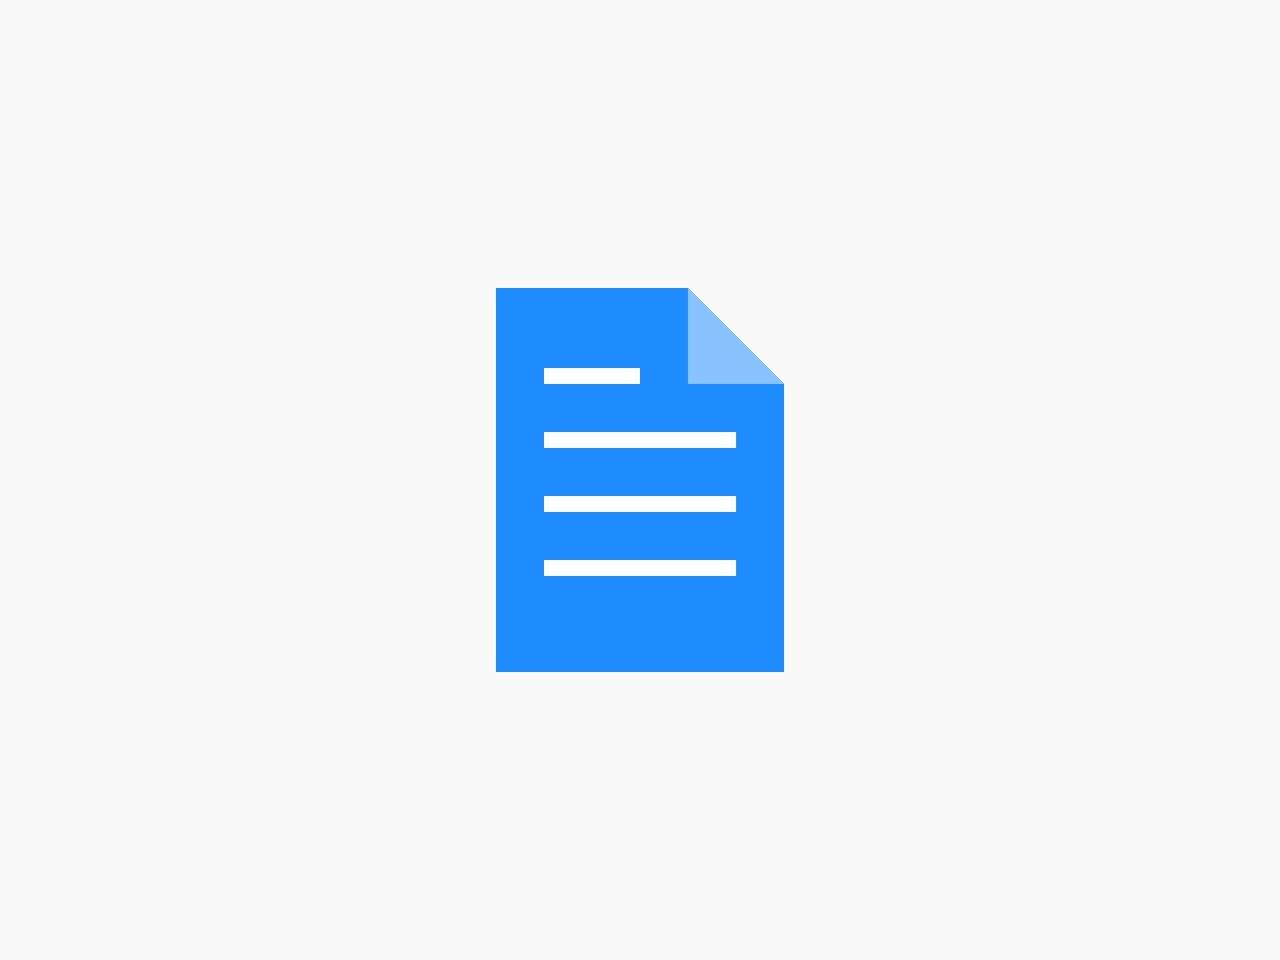 5 things to watch as Las Vegas Aces start WNBA season